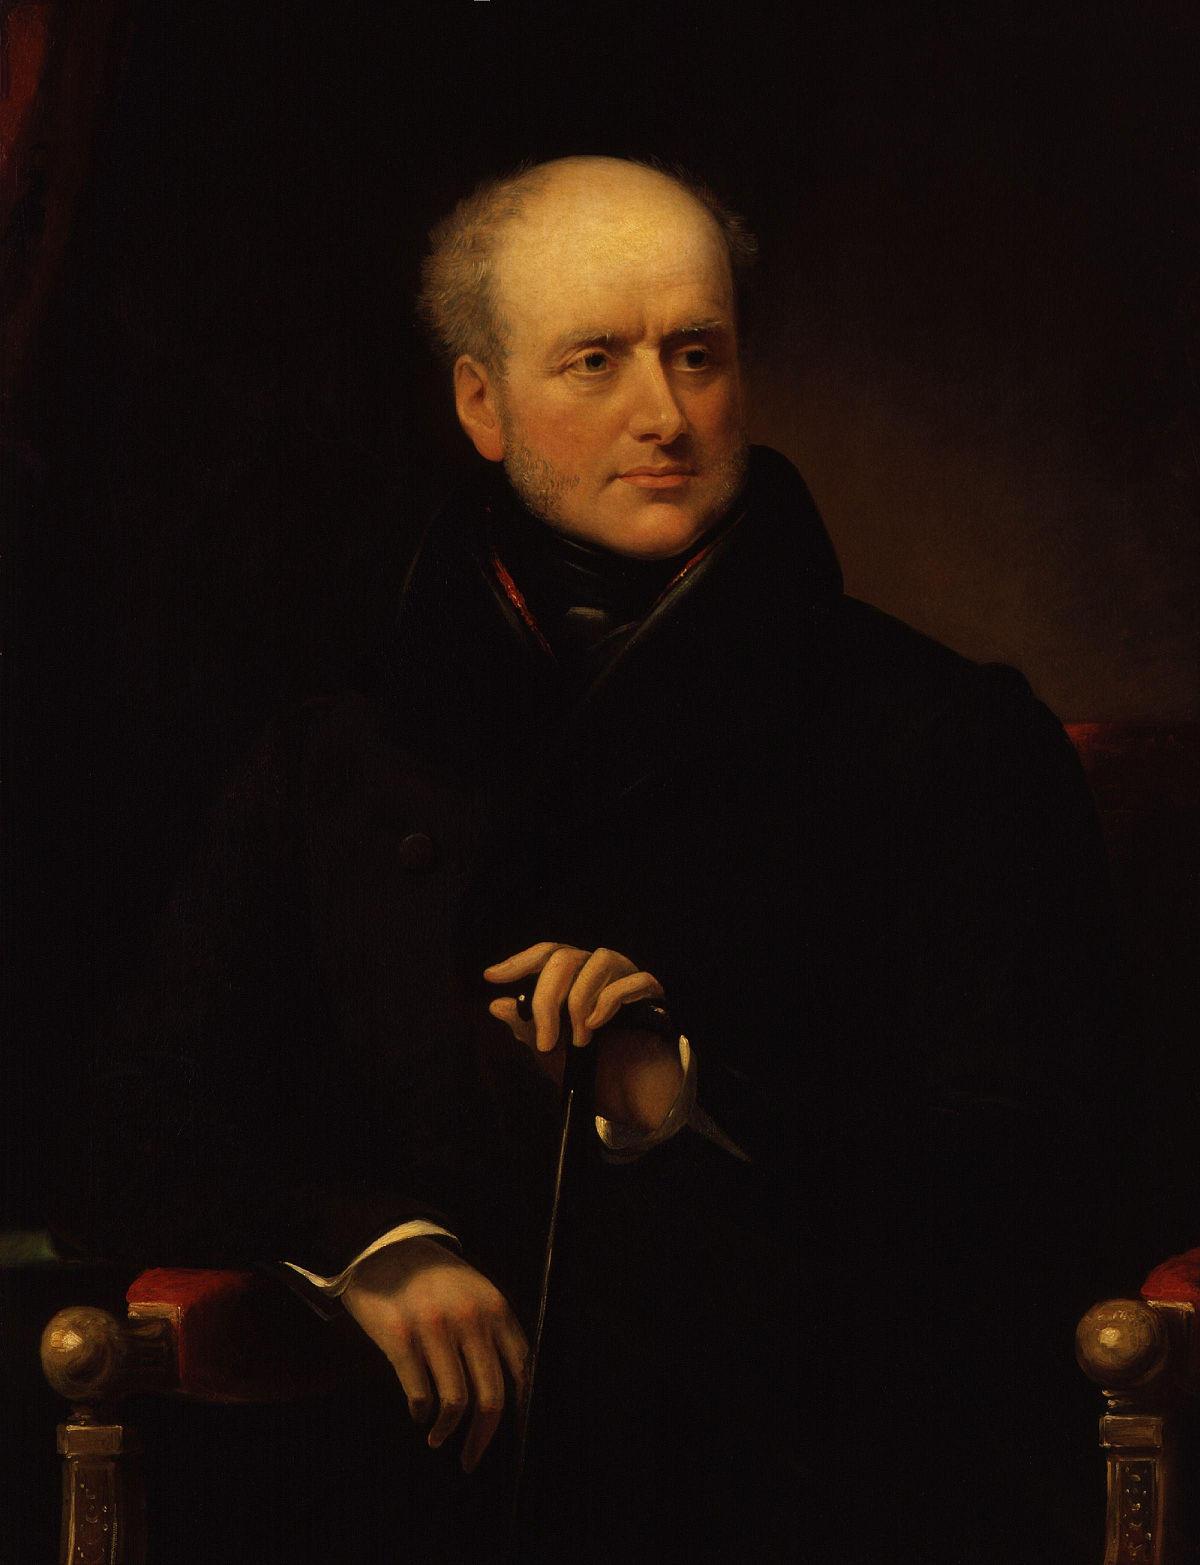 St Martins School >> James Smith (writer) - Wikipedia